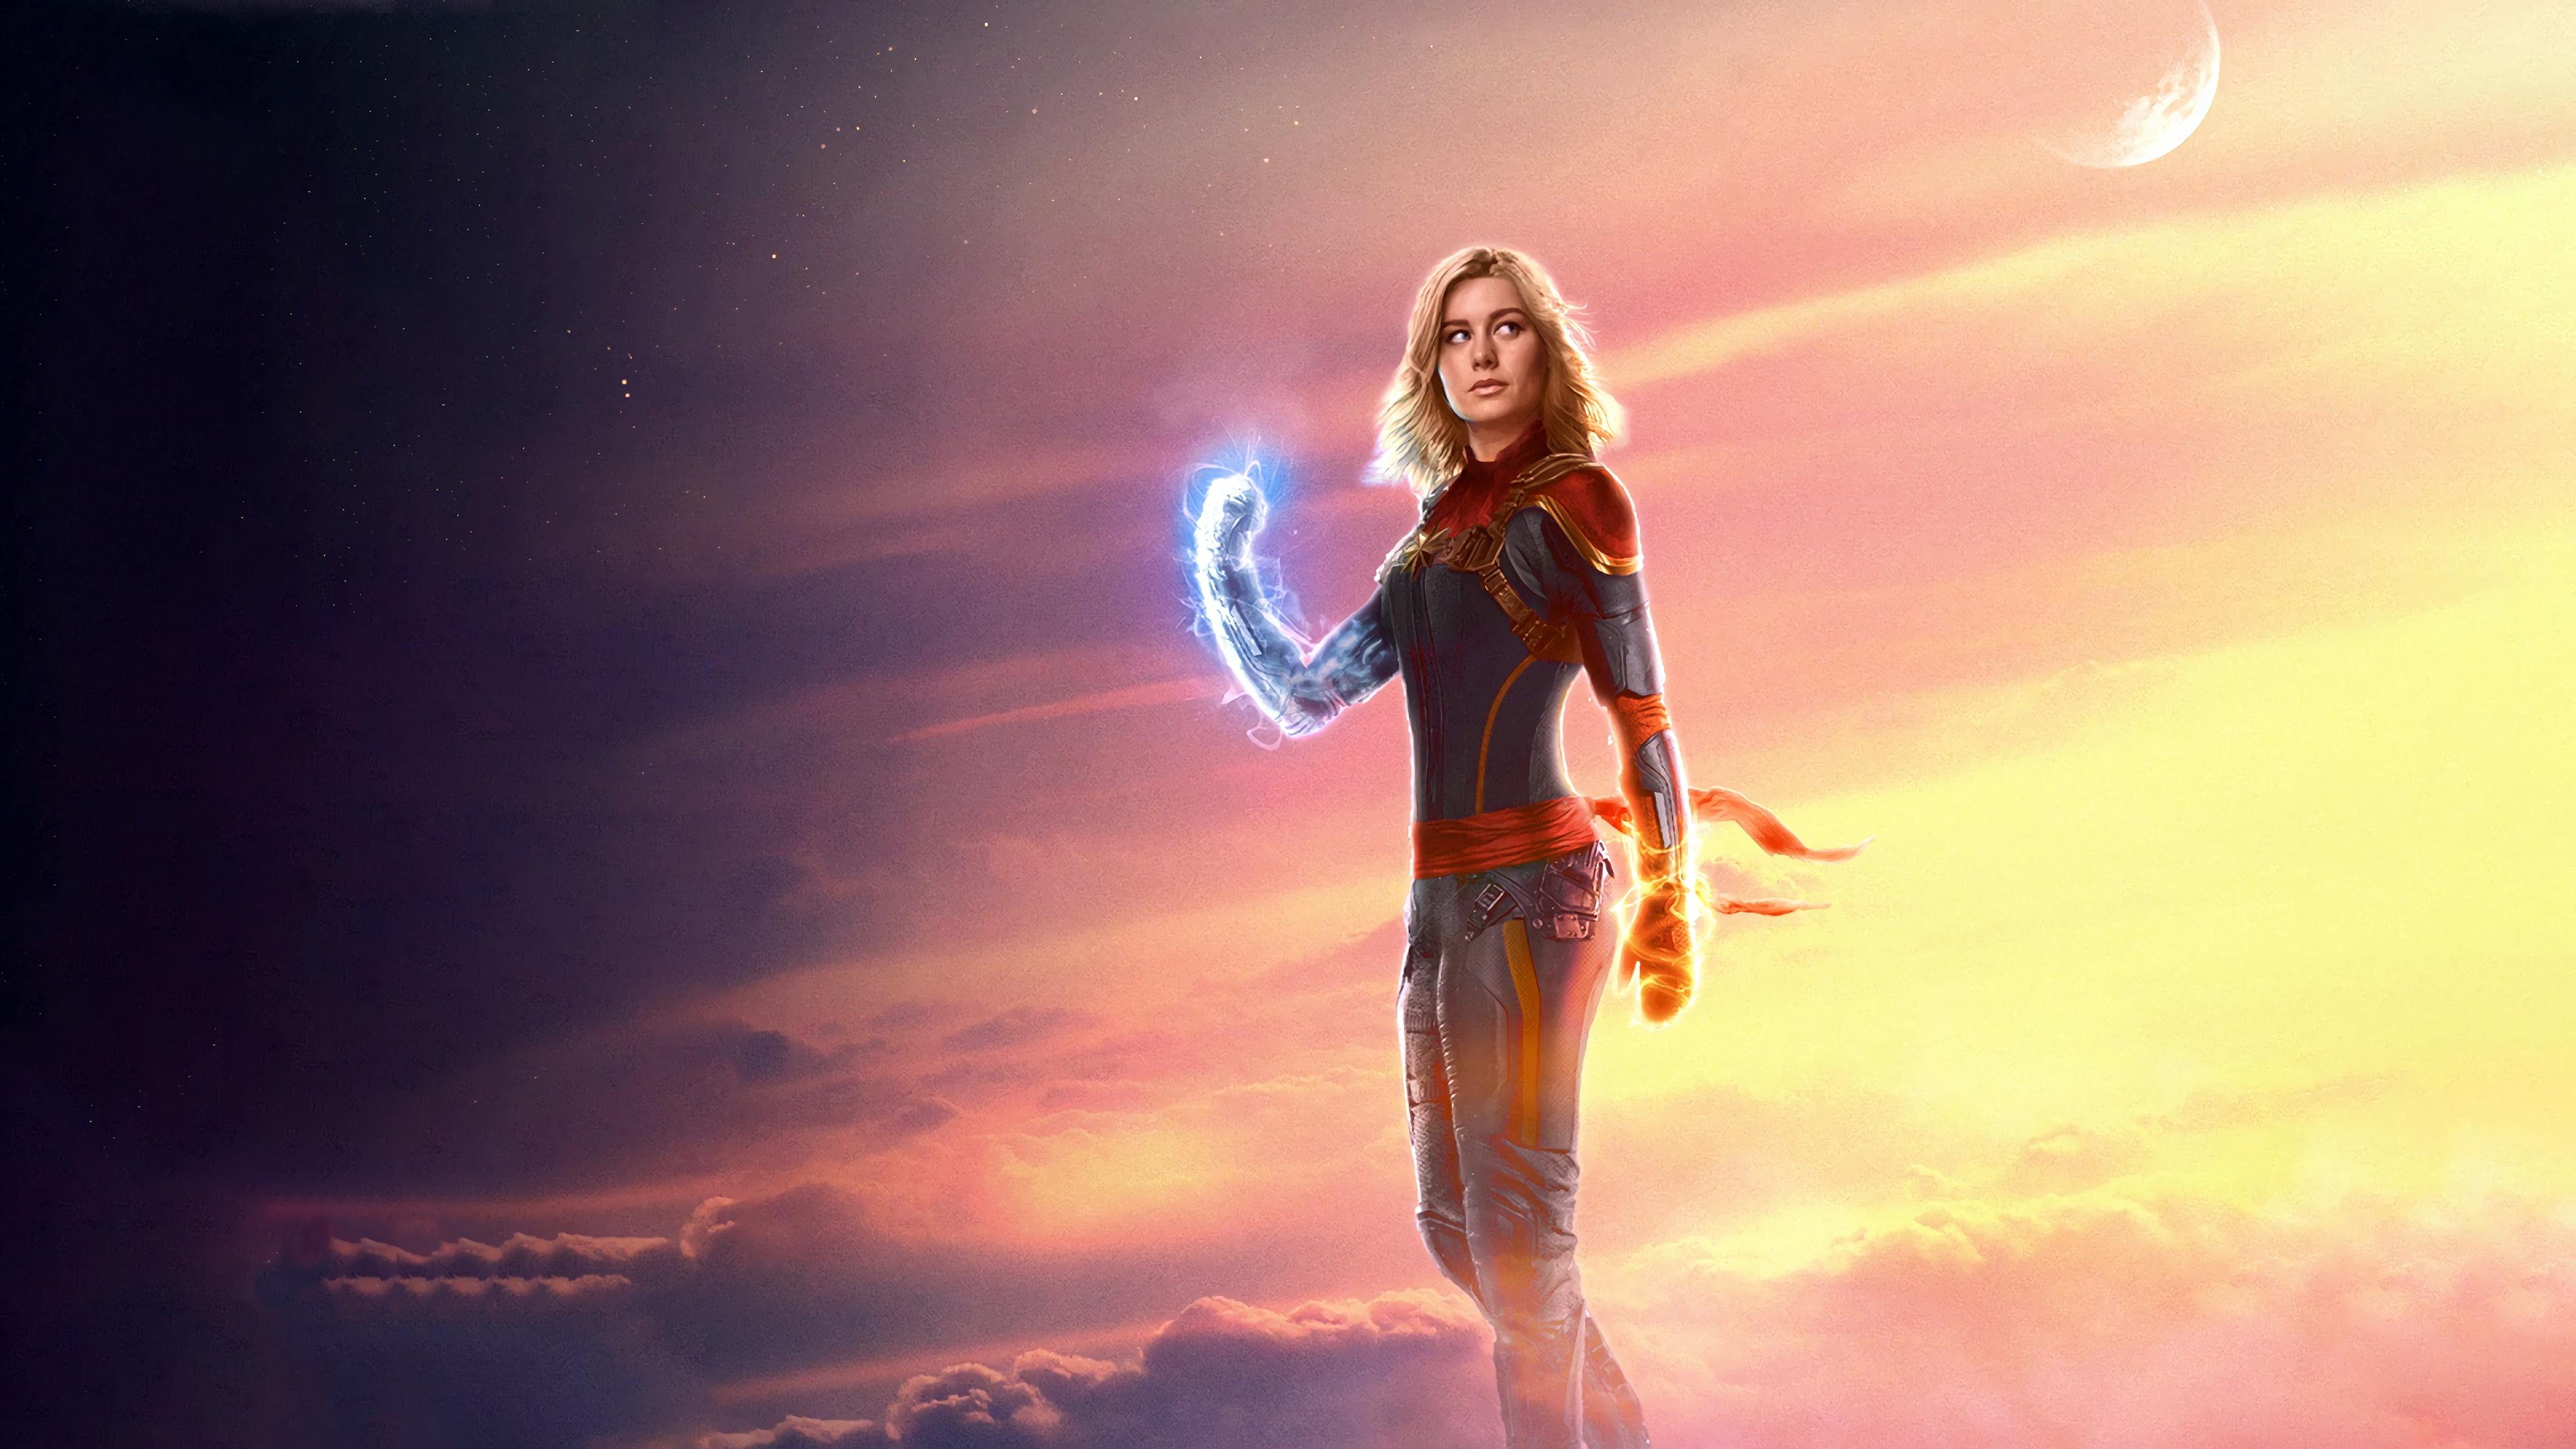 Wallpaper 4k Captain Marvel Carol Danvers Brie Larson Movie 2019 4k